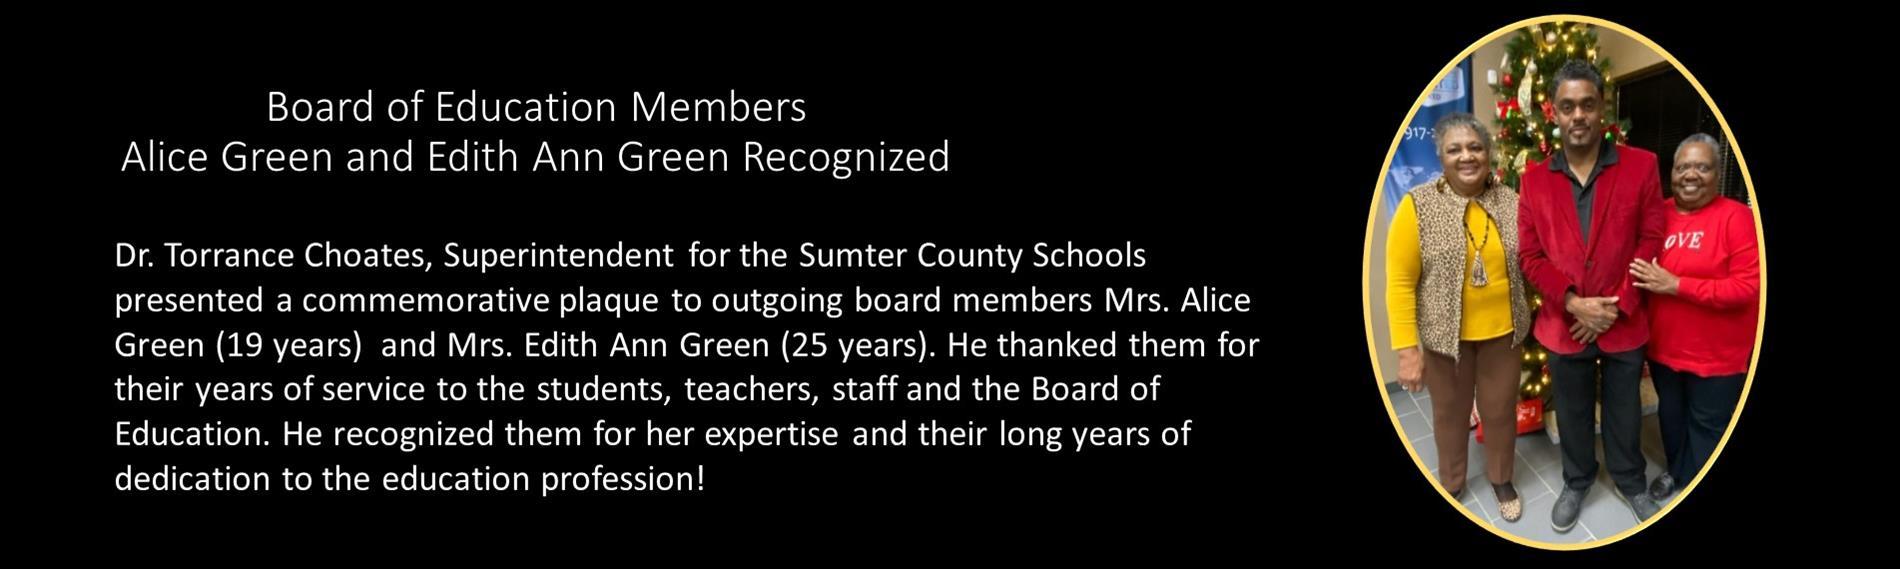 BOE Members Recognized